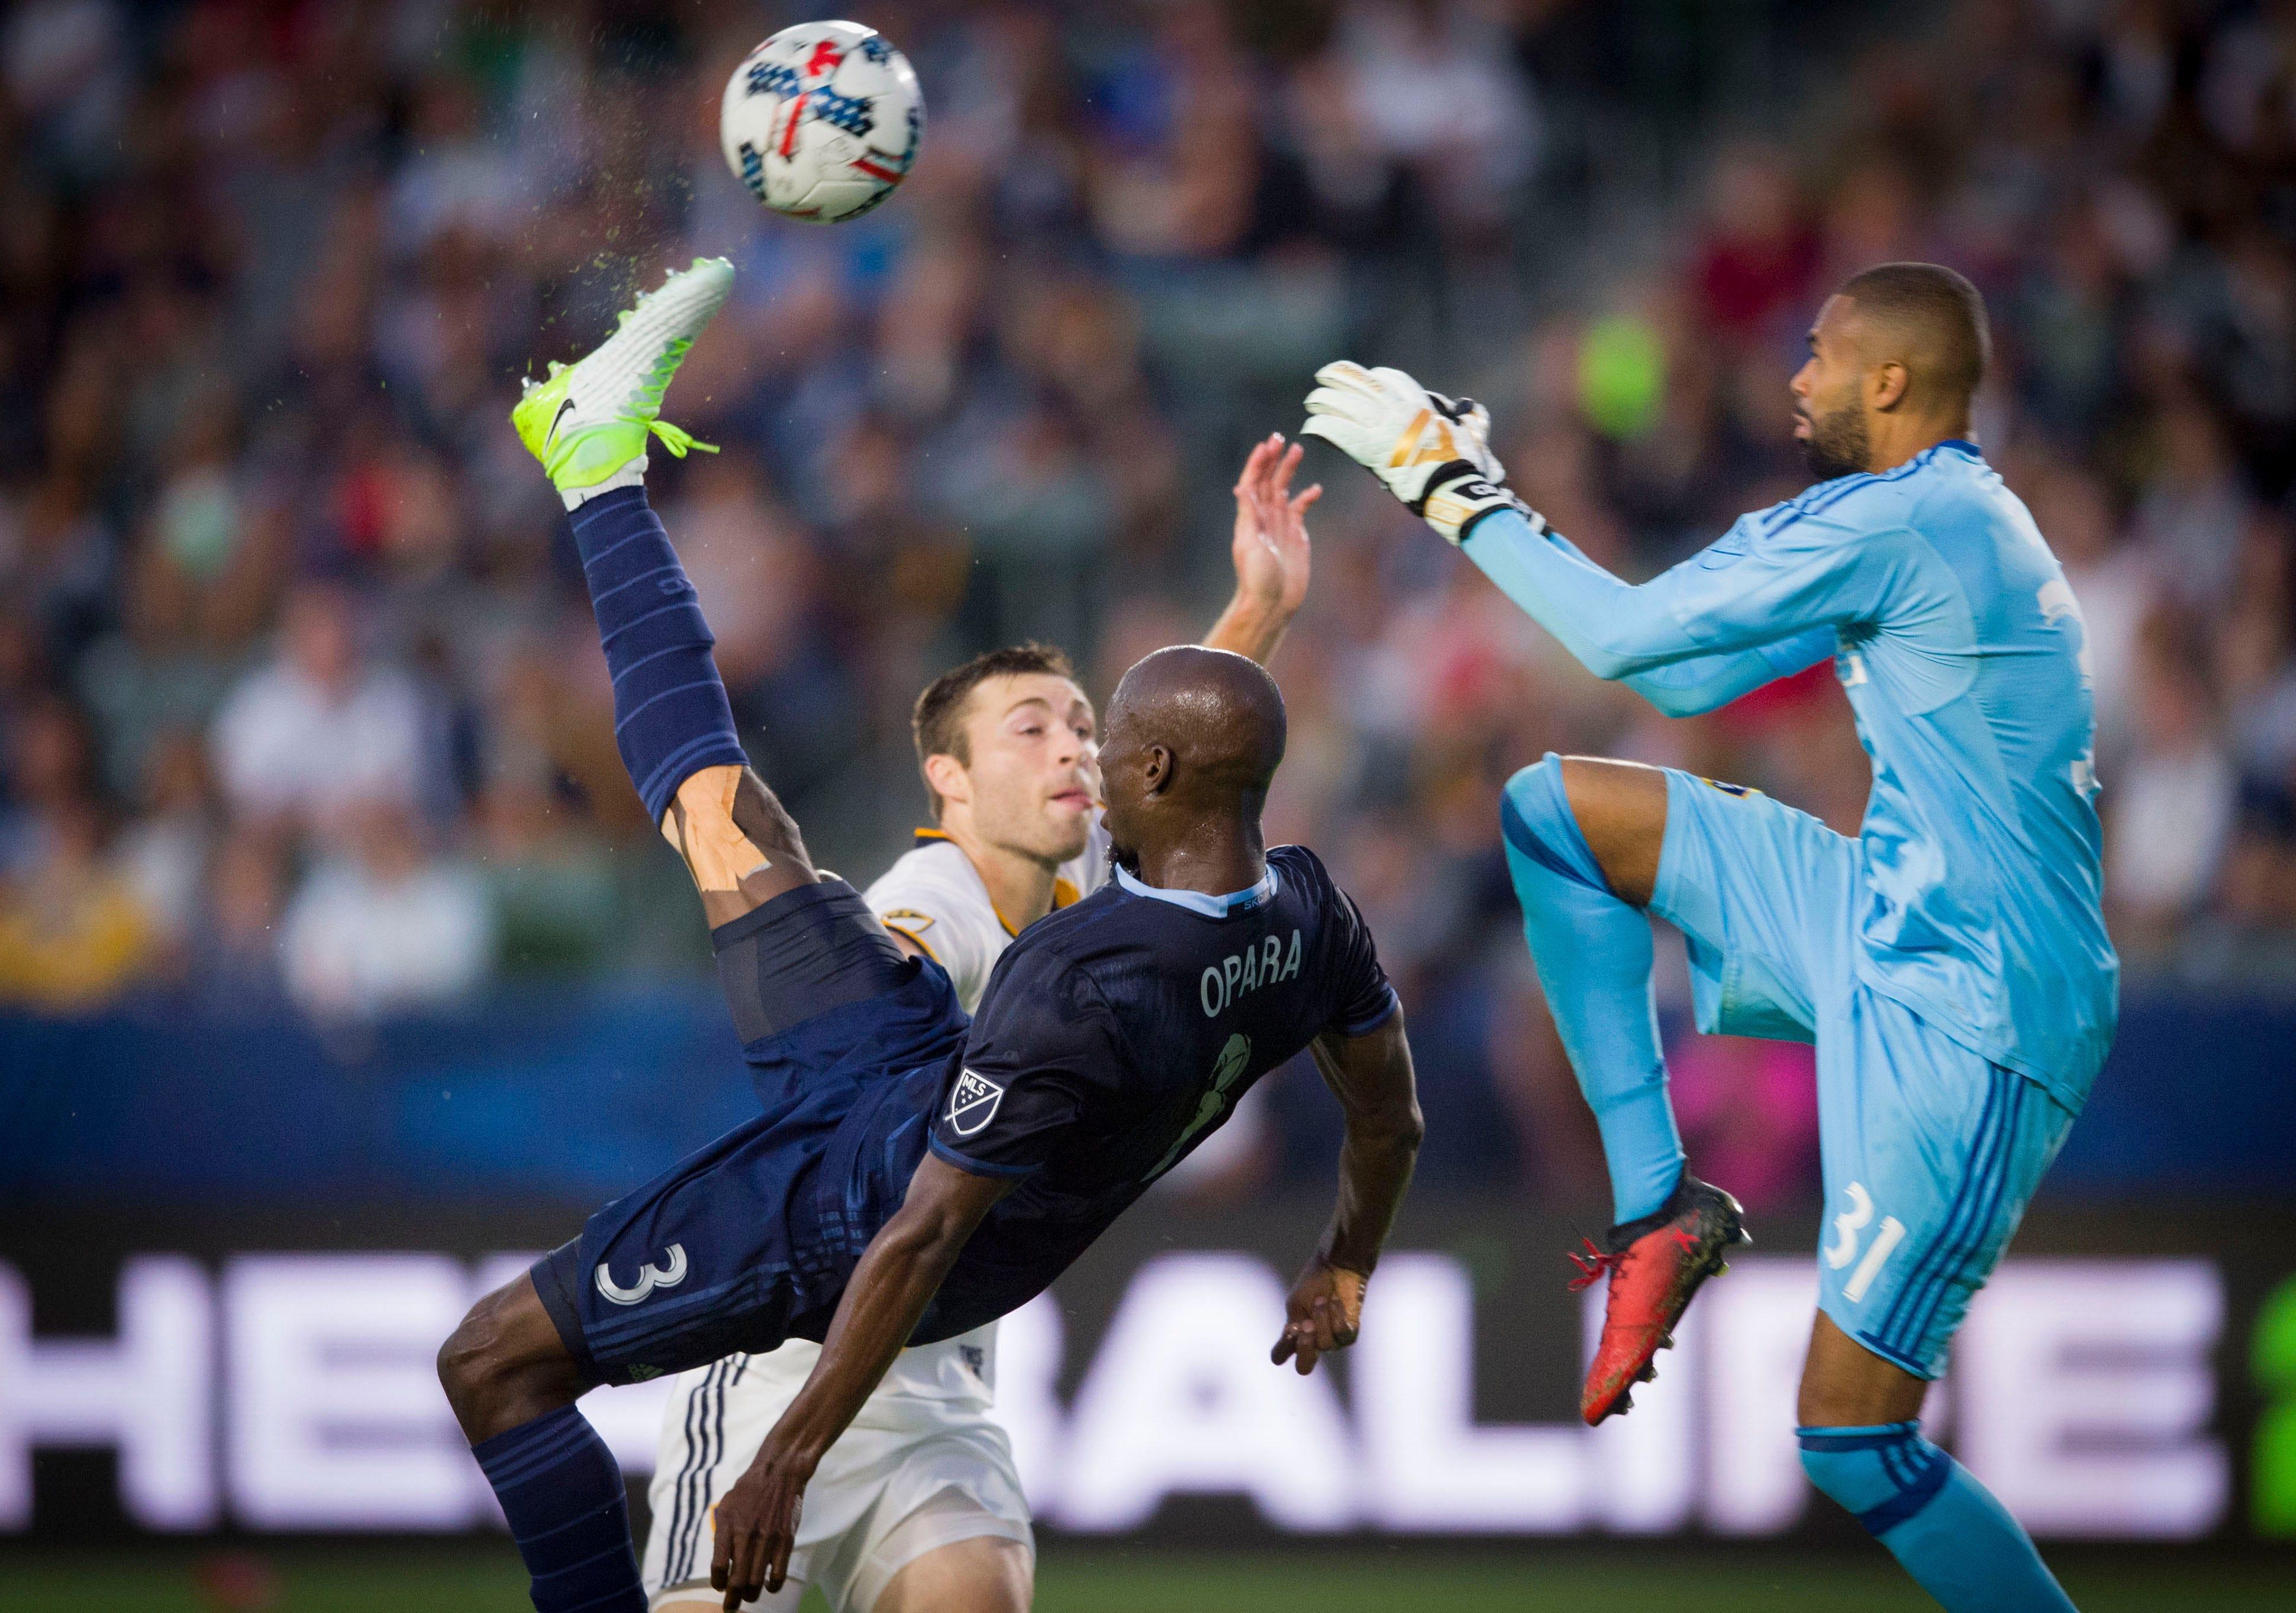 Kansas City's Ike Opara scores acrobatic goal